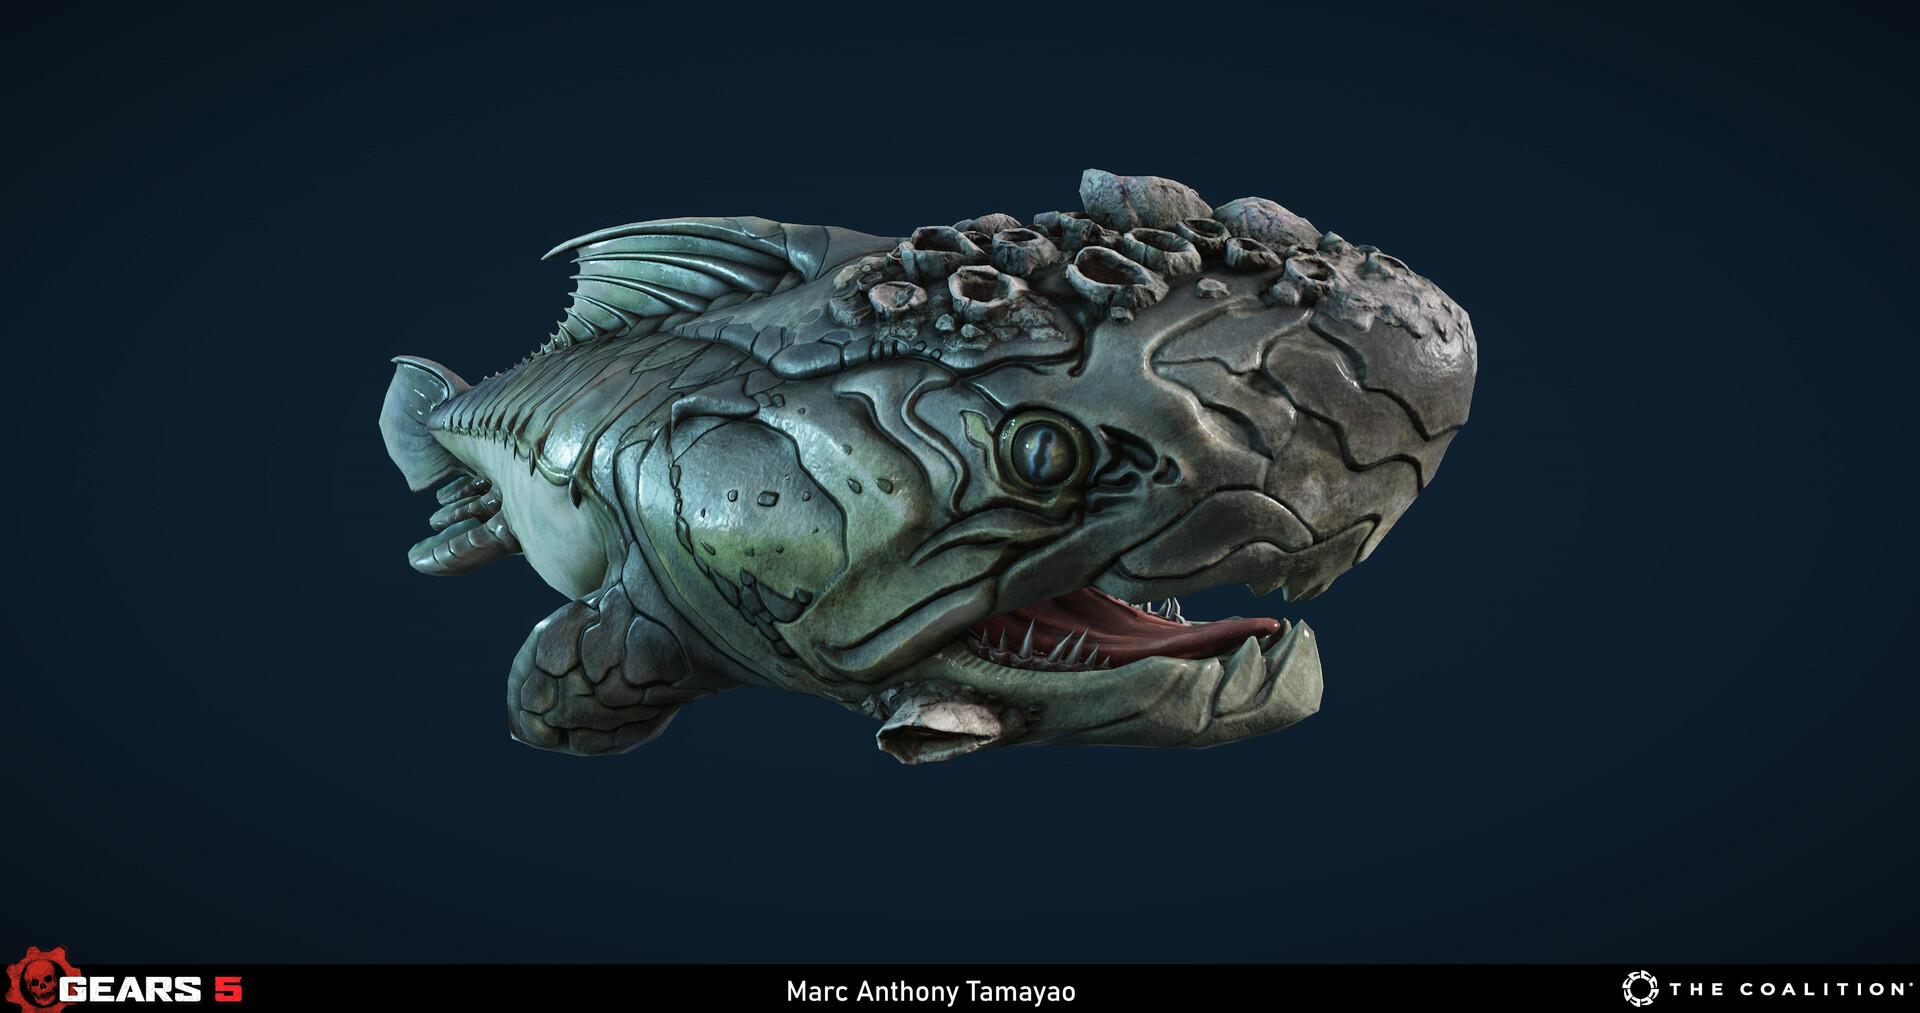 Armored Fish